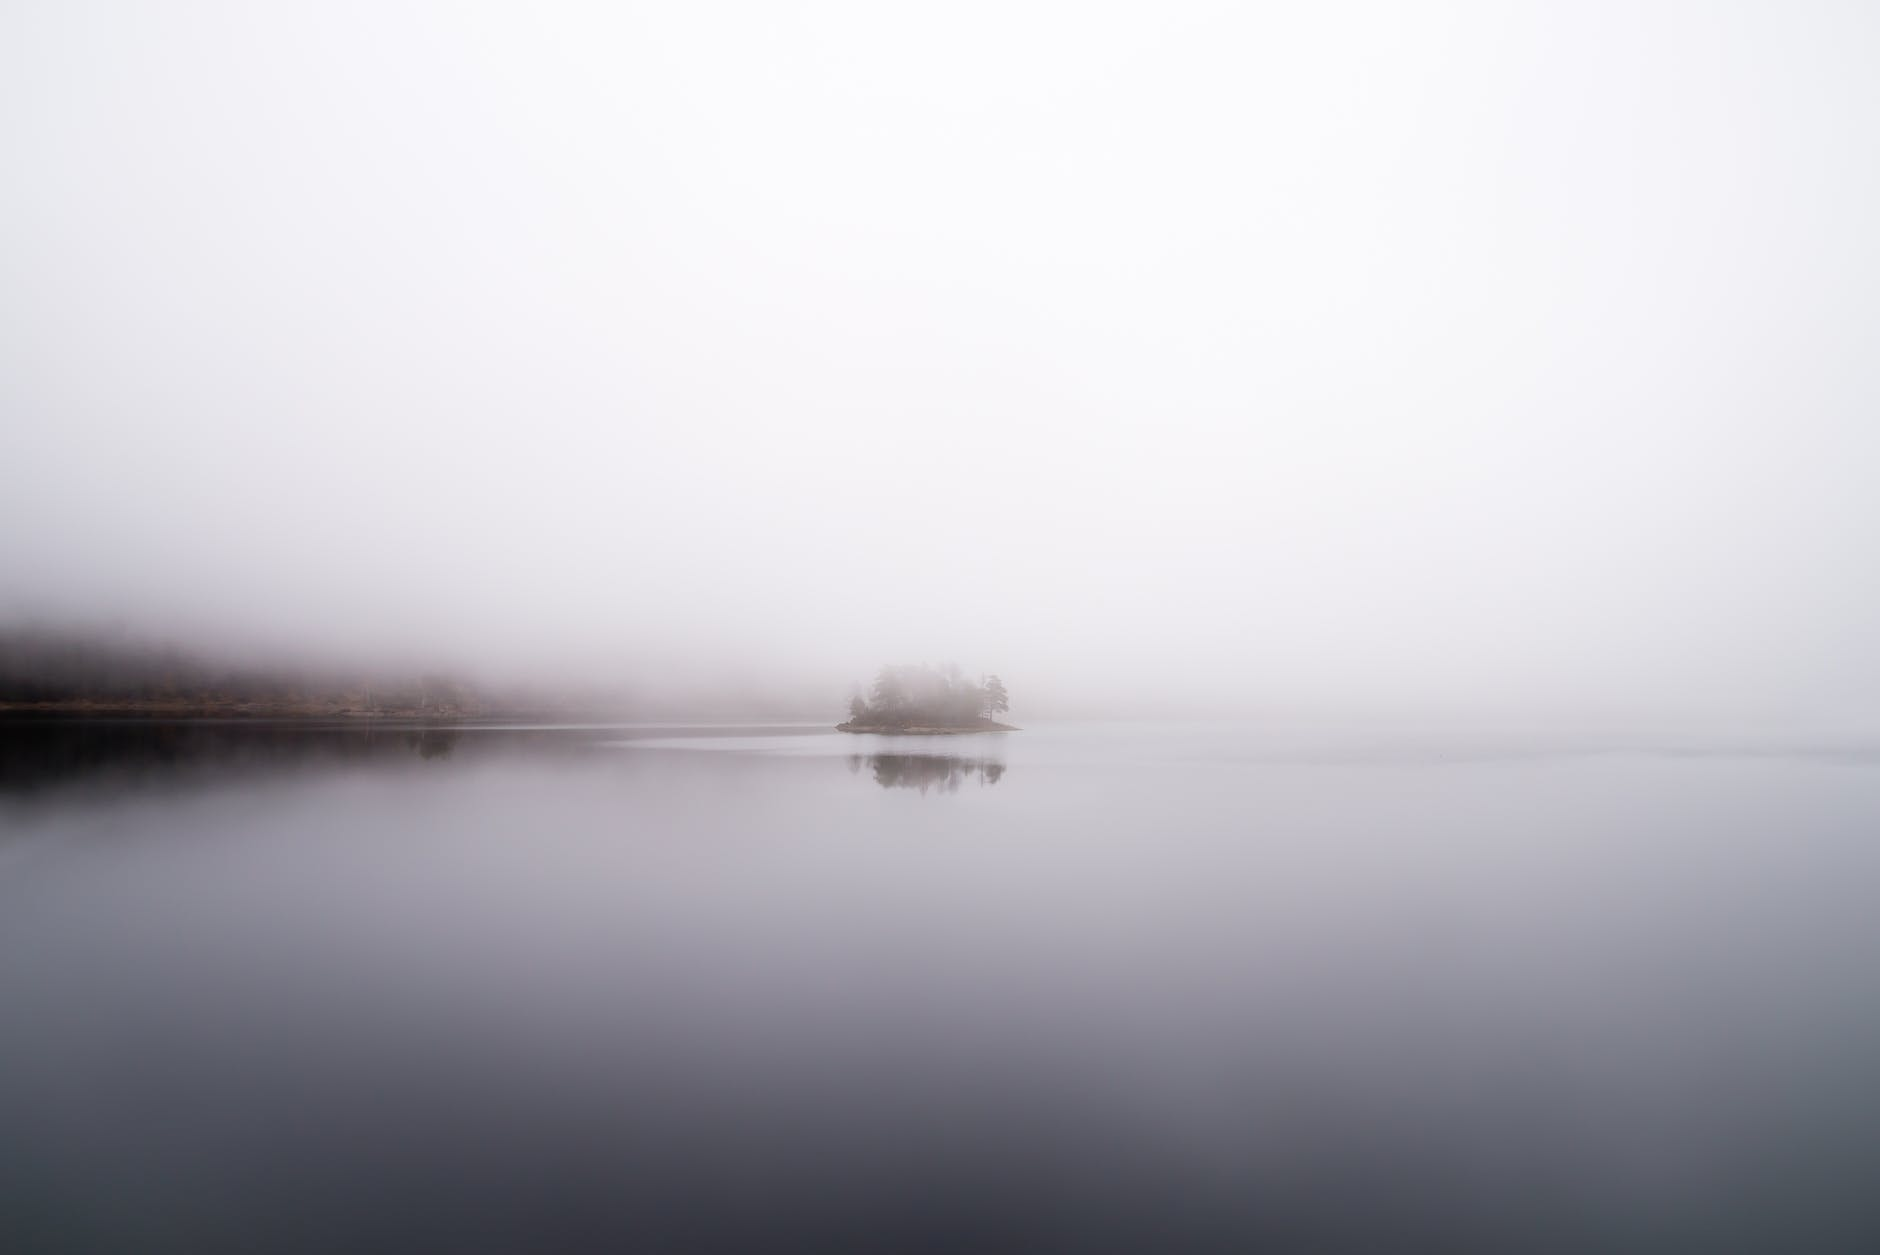 blur calm waters dawn daylight